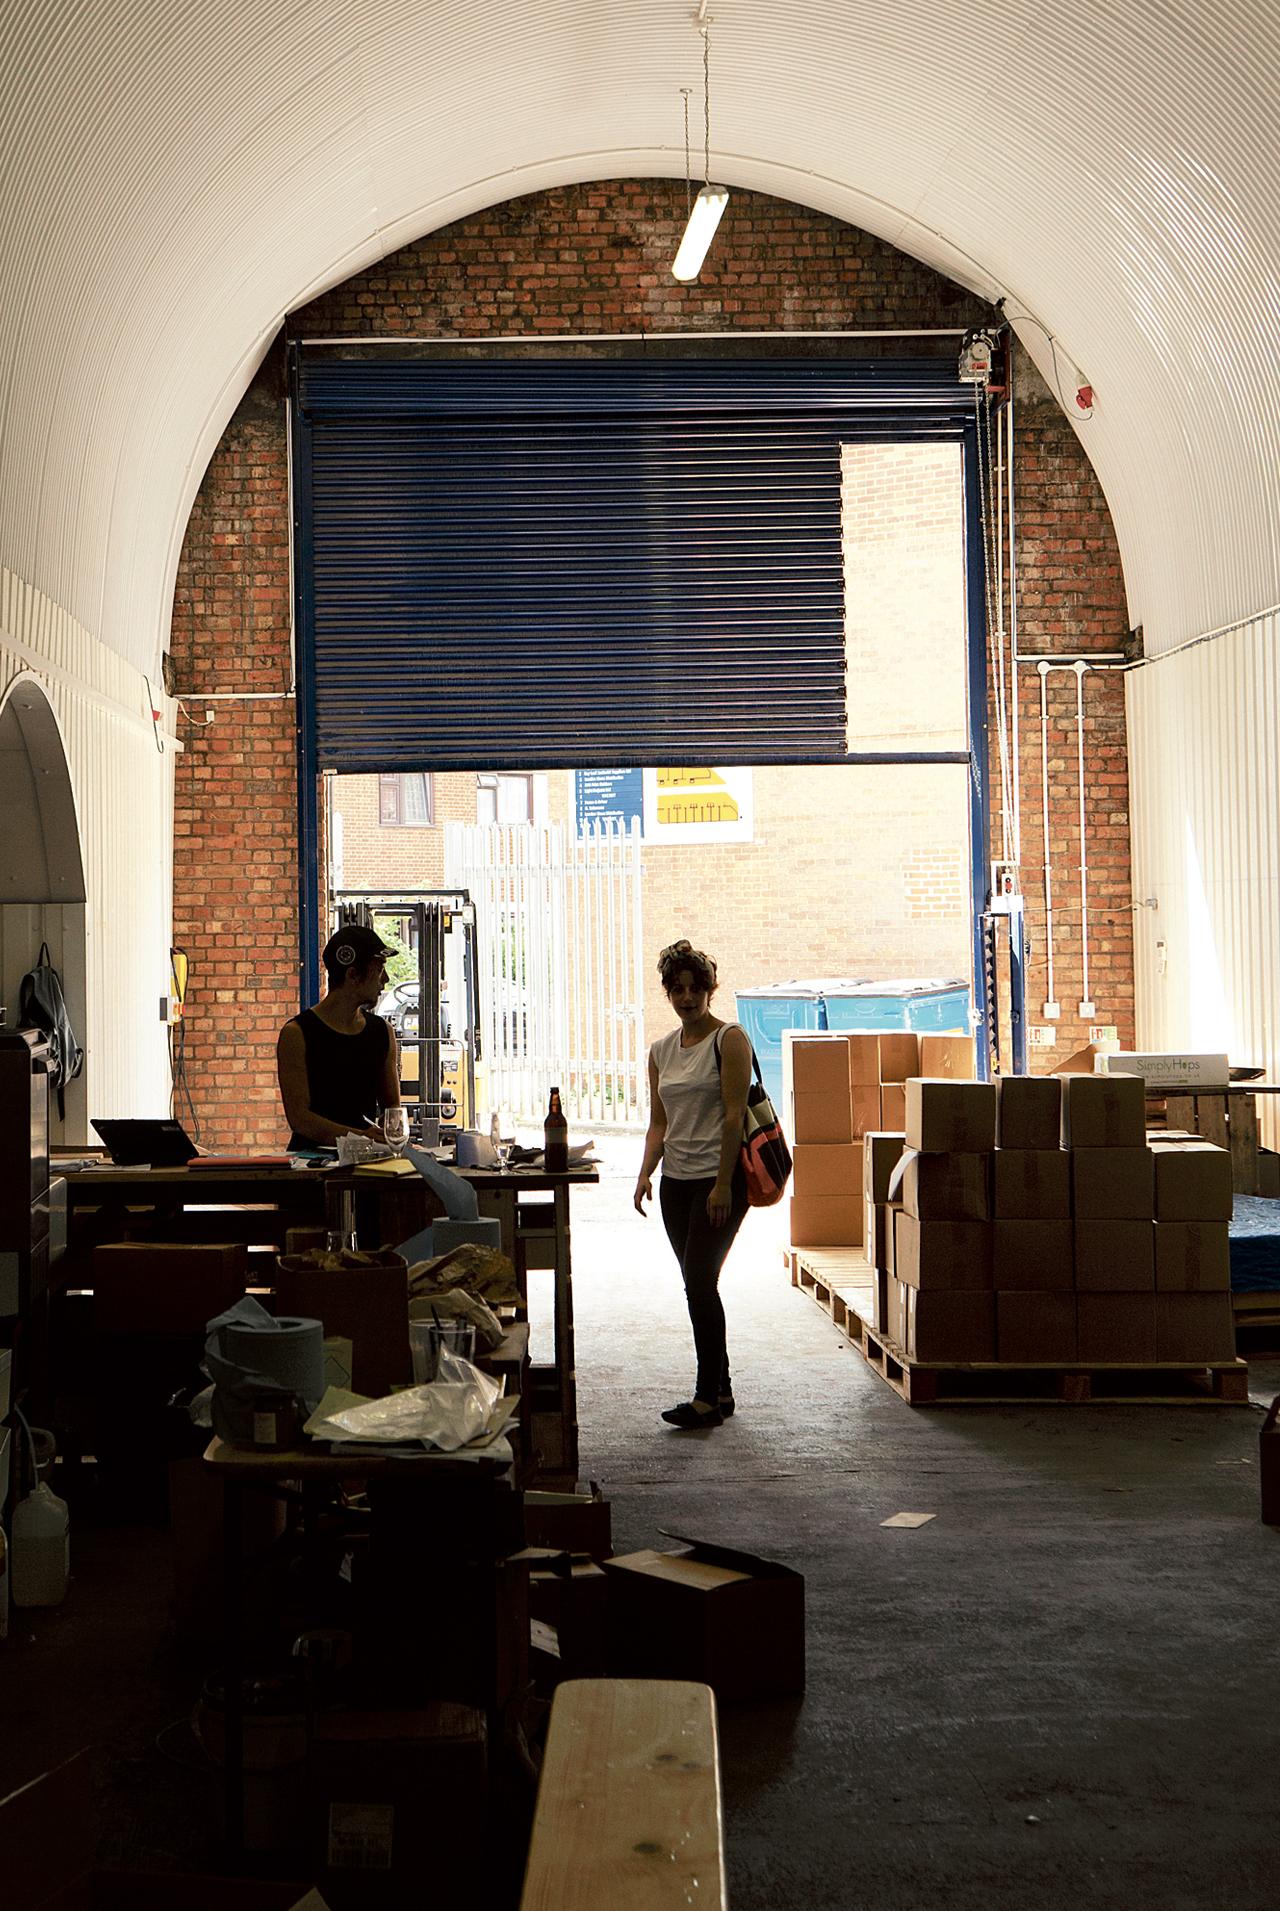 Kernel Brewery, Bermondsey